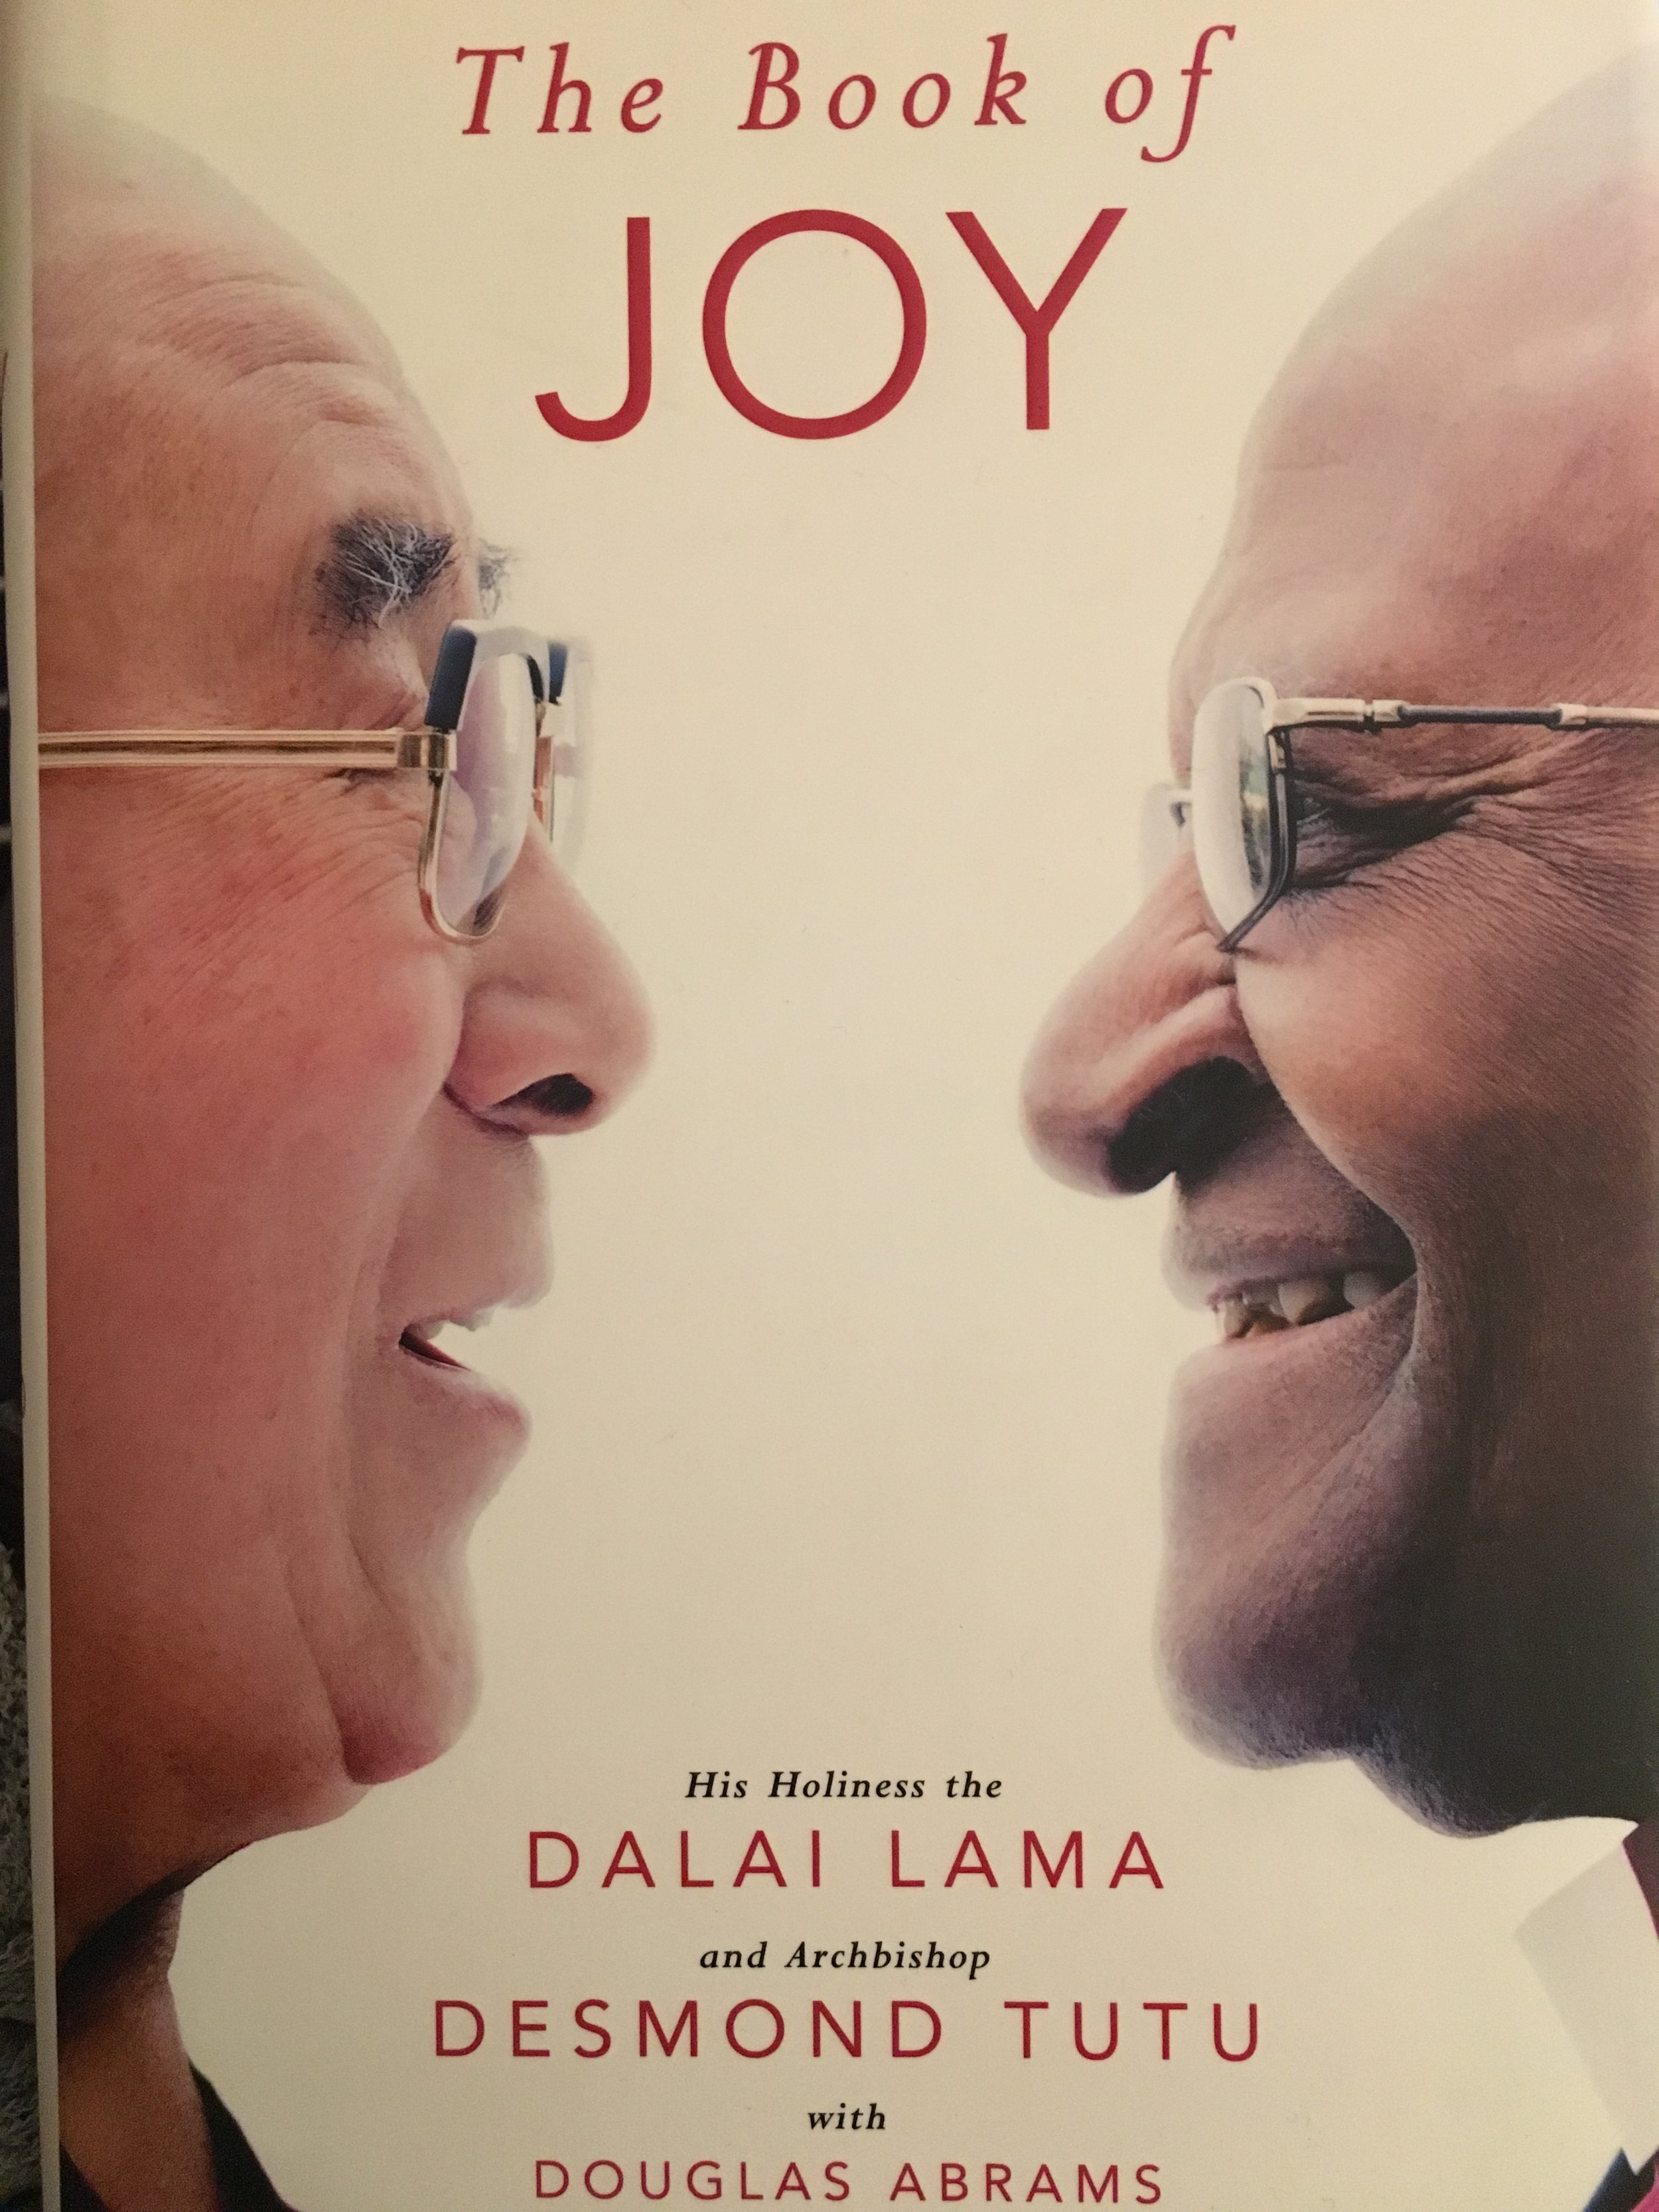 The Book of Joy  - His Holiness the Dalai Lama and Archbishop Desmond Tutu